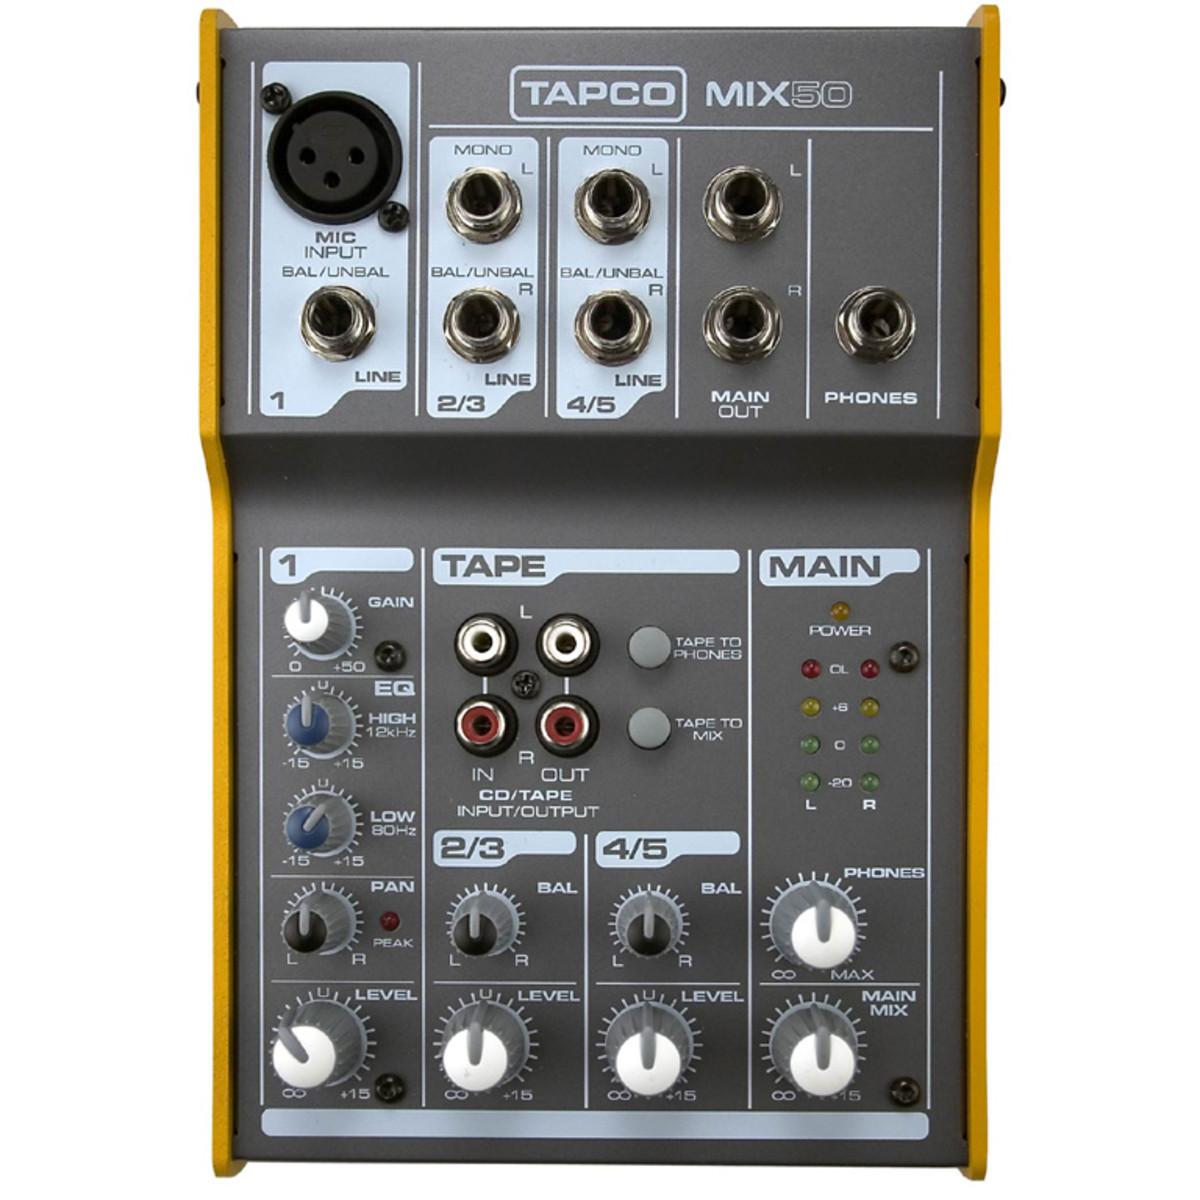 Tapco MIX 50 Ultra Compact Mixer at Gear4music